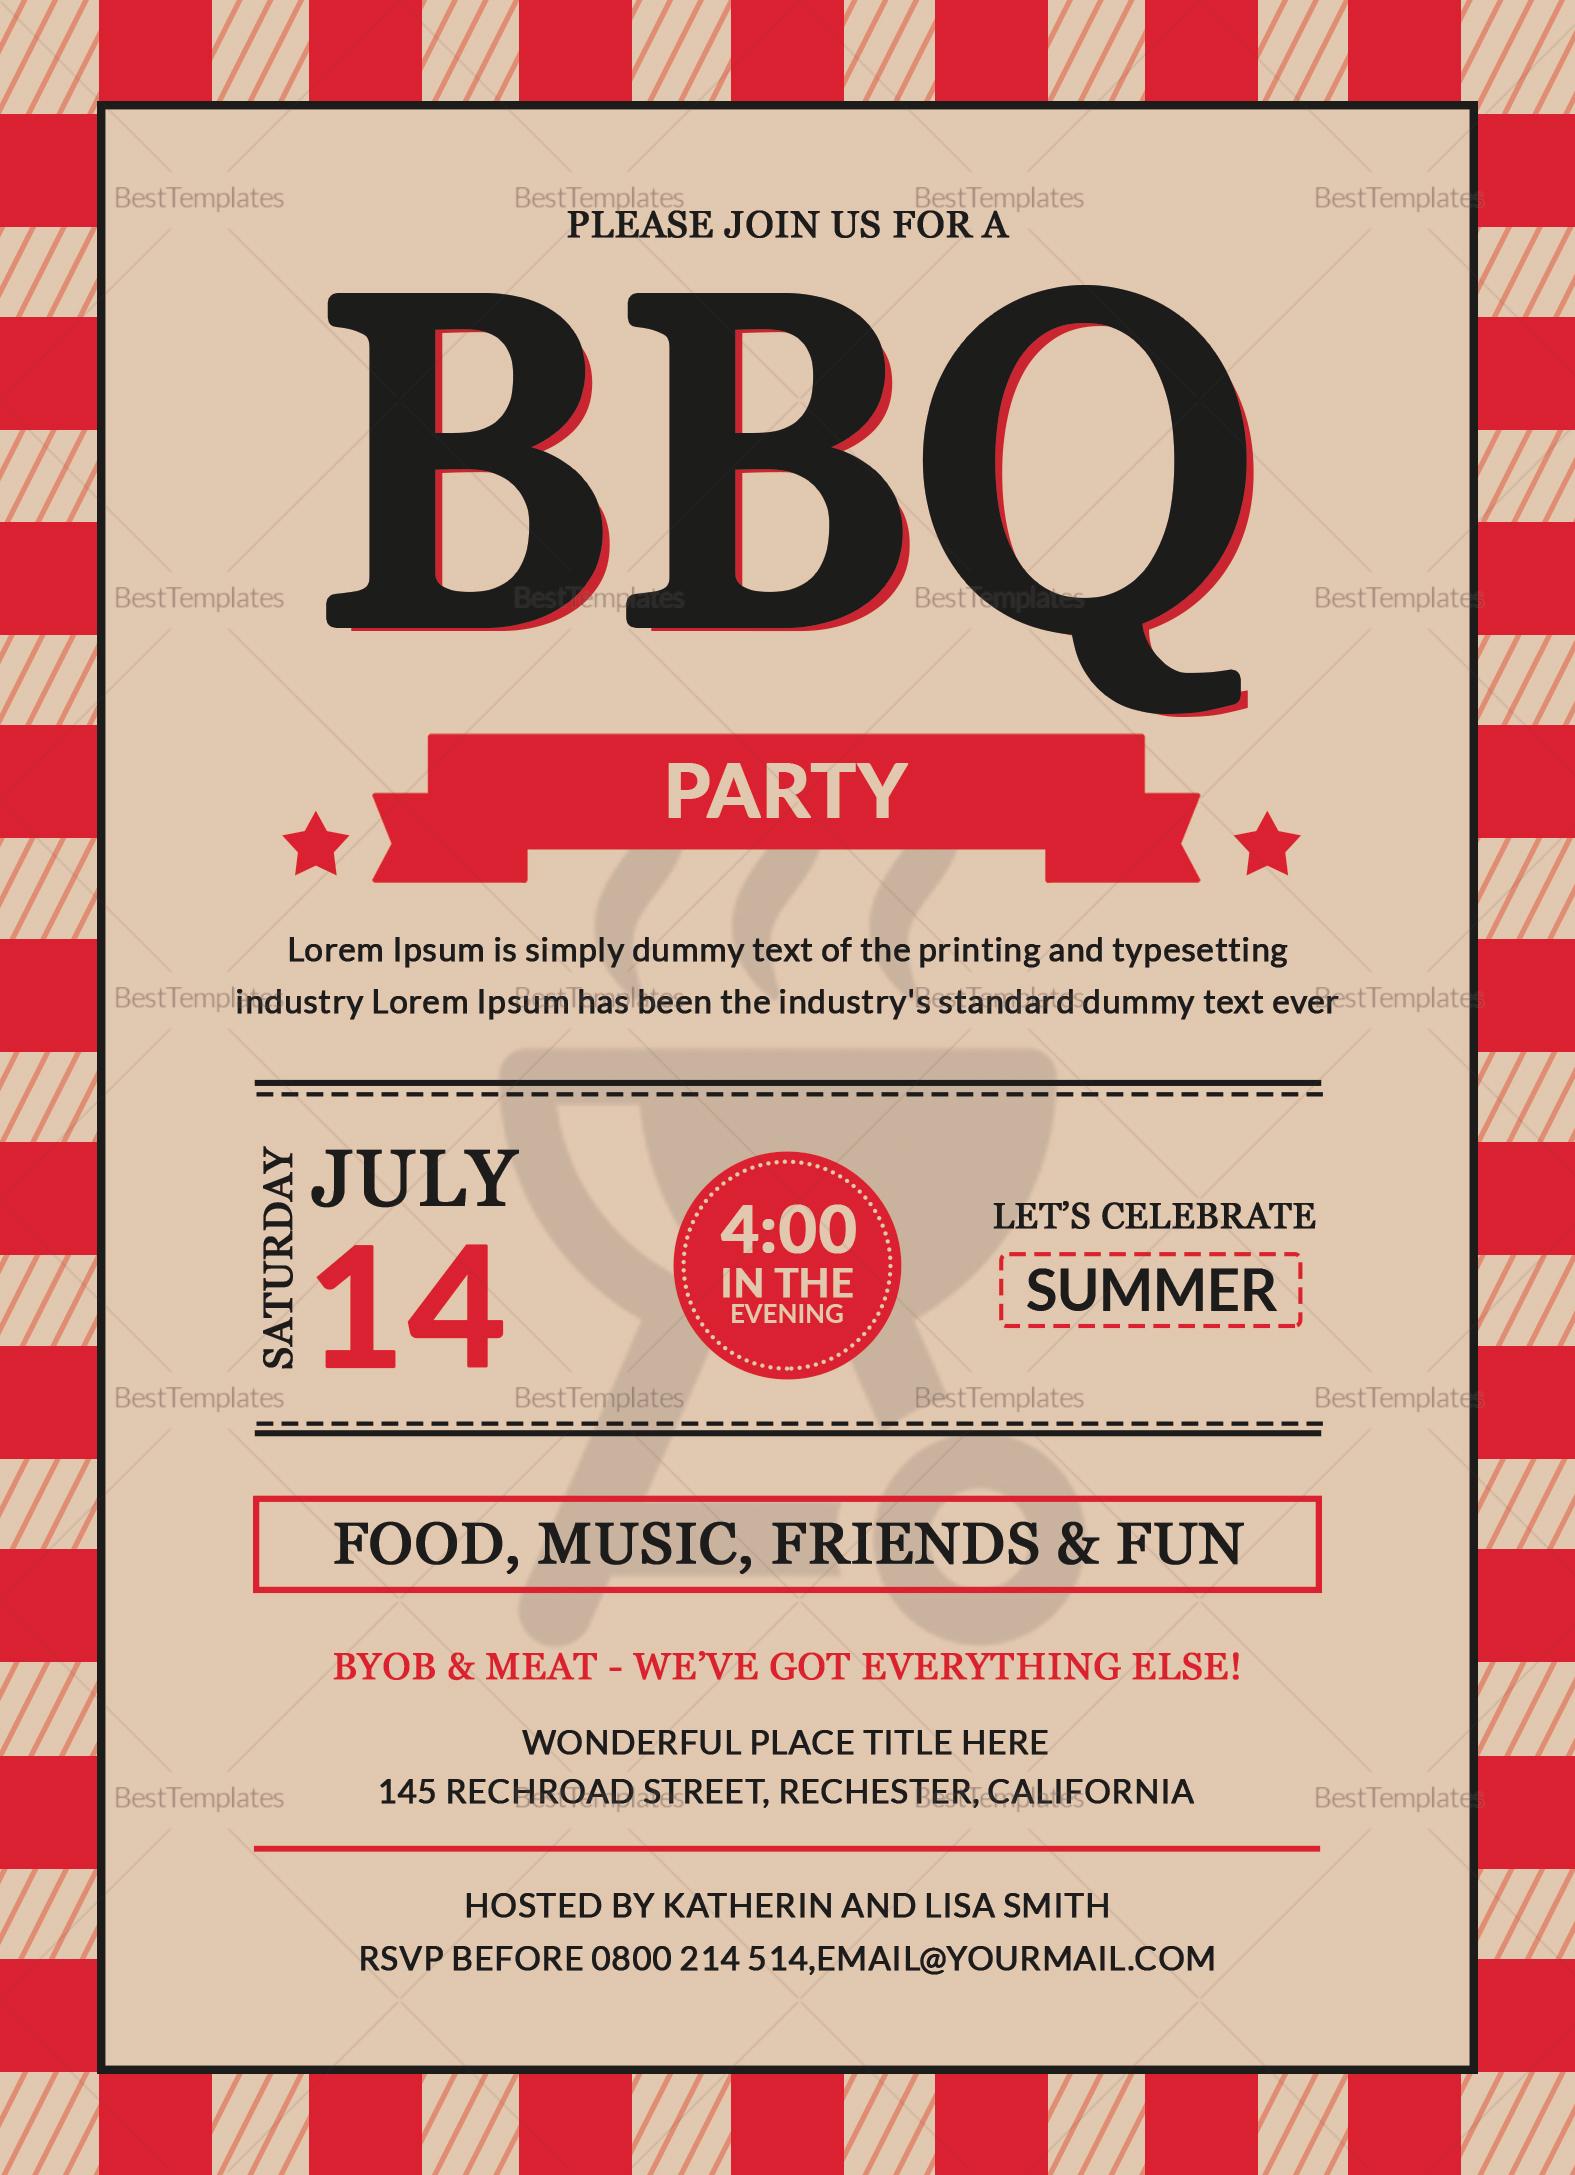 BBQ Party Invitation Card Design Template